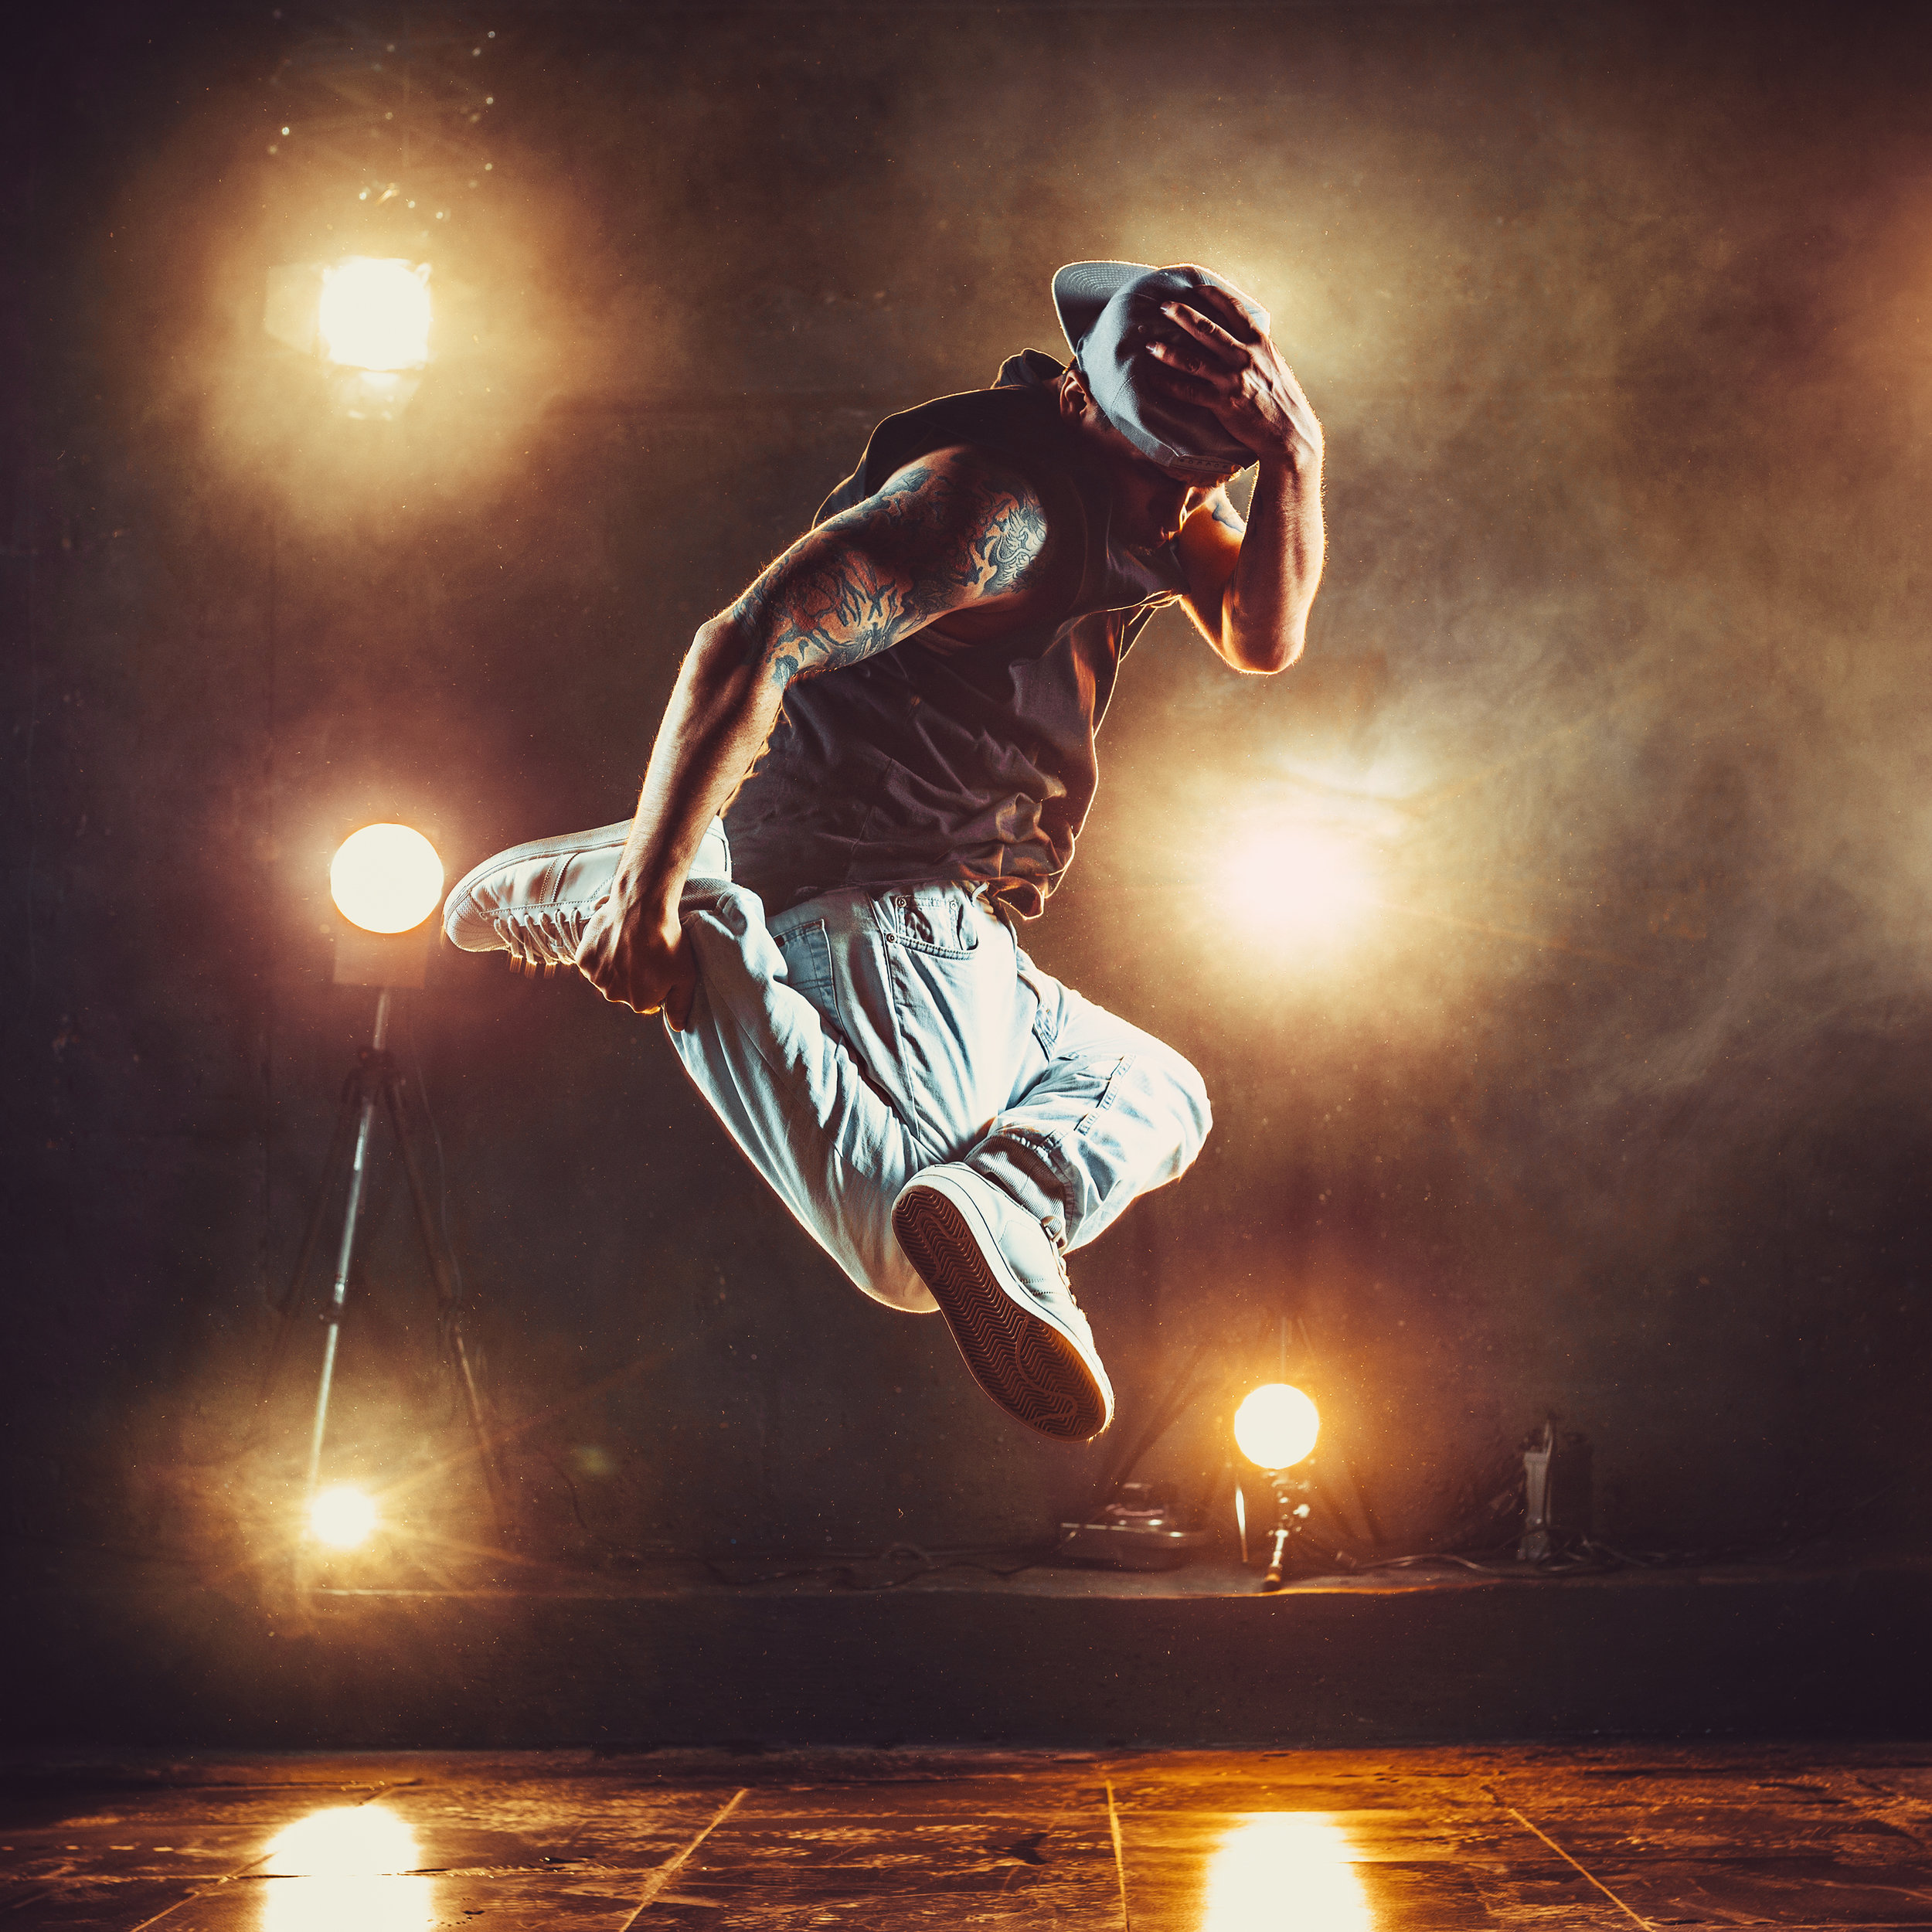 bigstock-Young-cool-man-break-dancer-ju-216838003.jpg